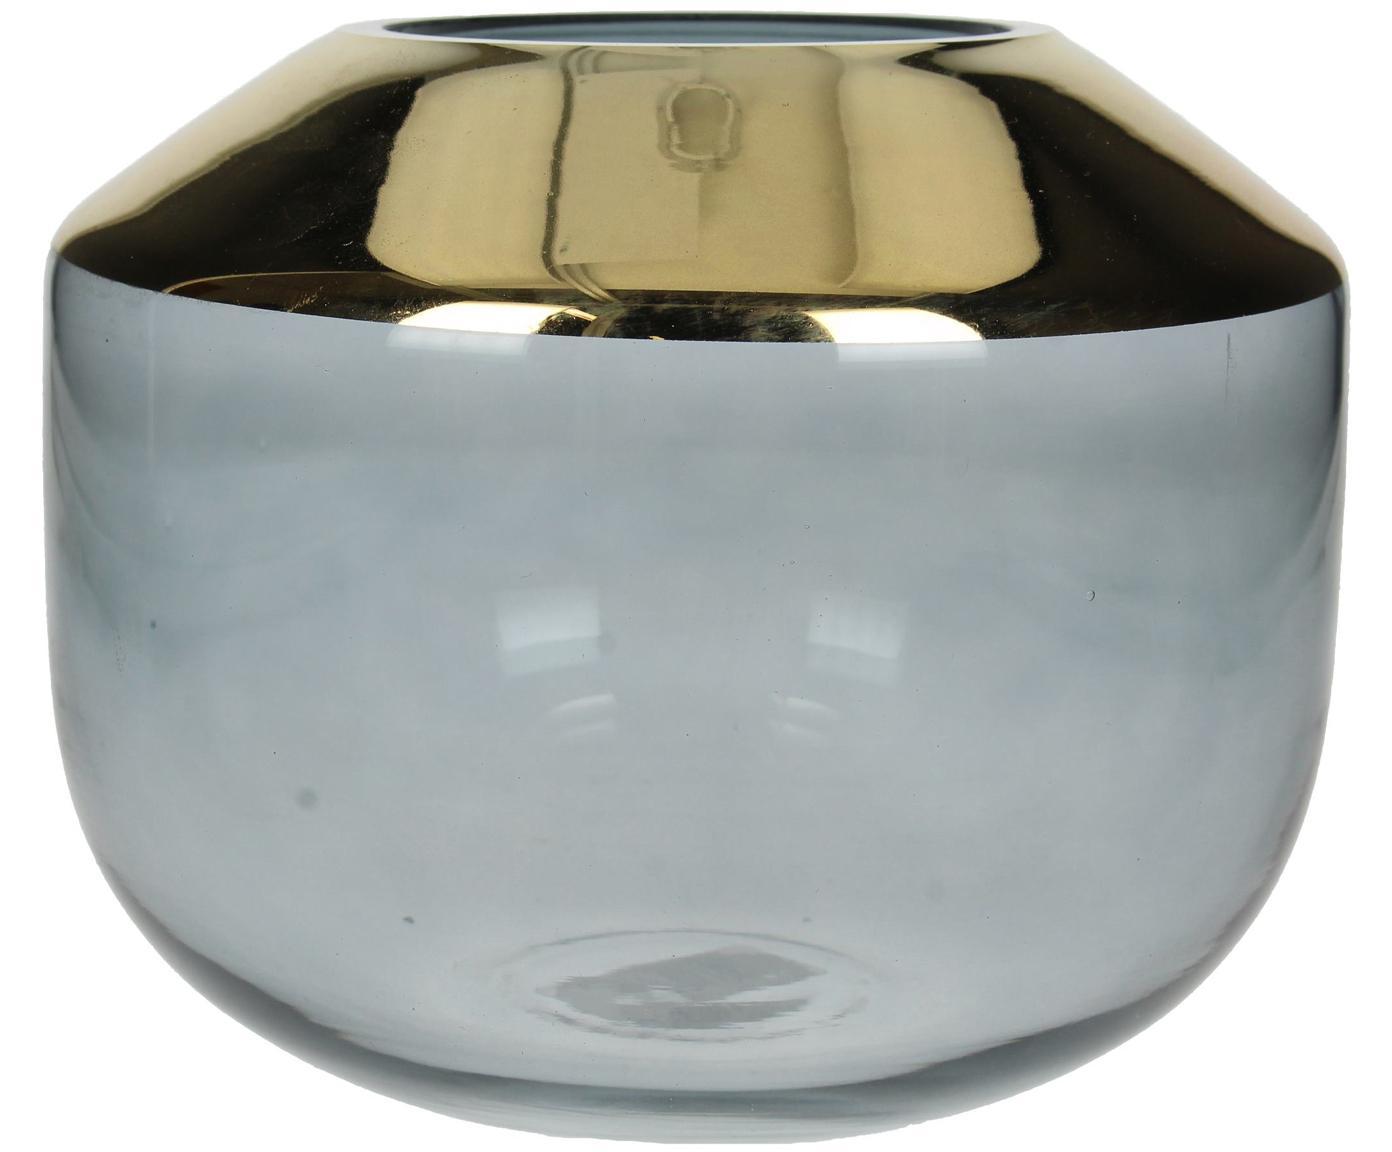 Vaso in vetro Janak, Vetro, Grigio, trasparente, dorato, Ø 18 x Alt. 15 cm